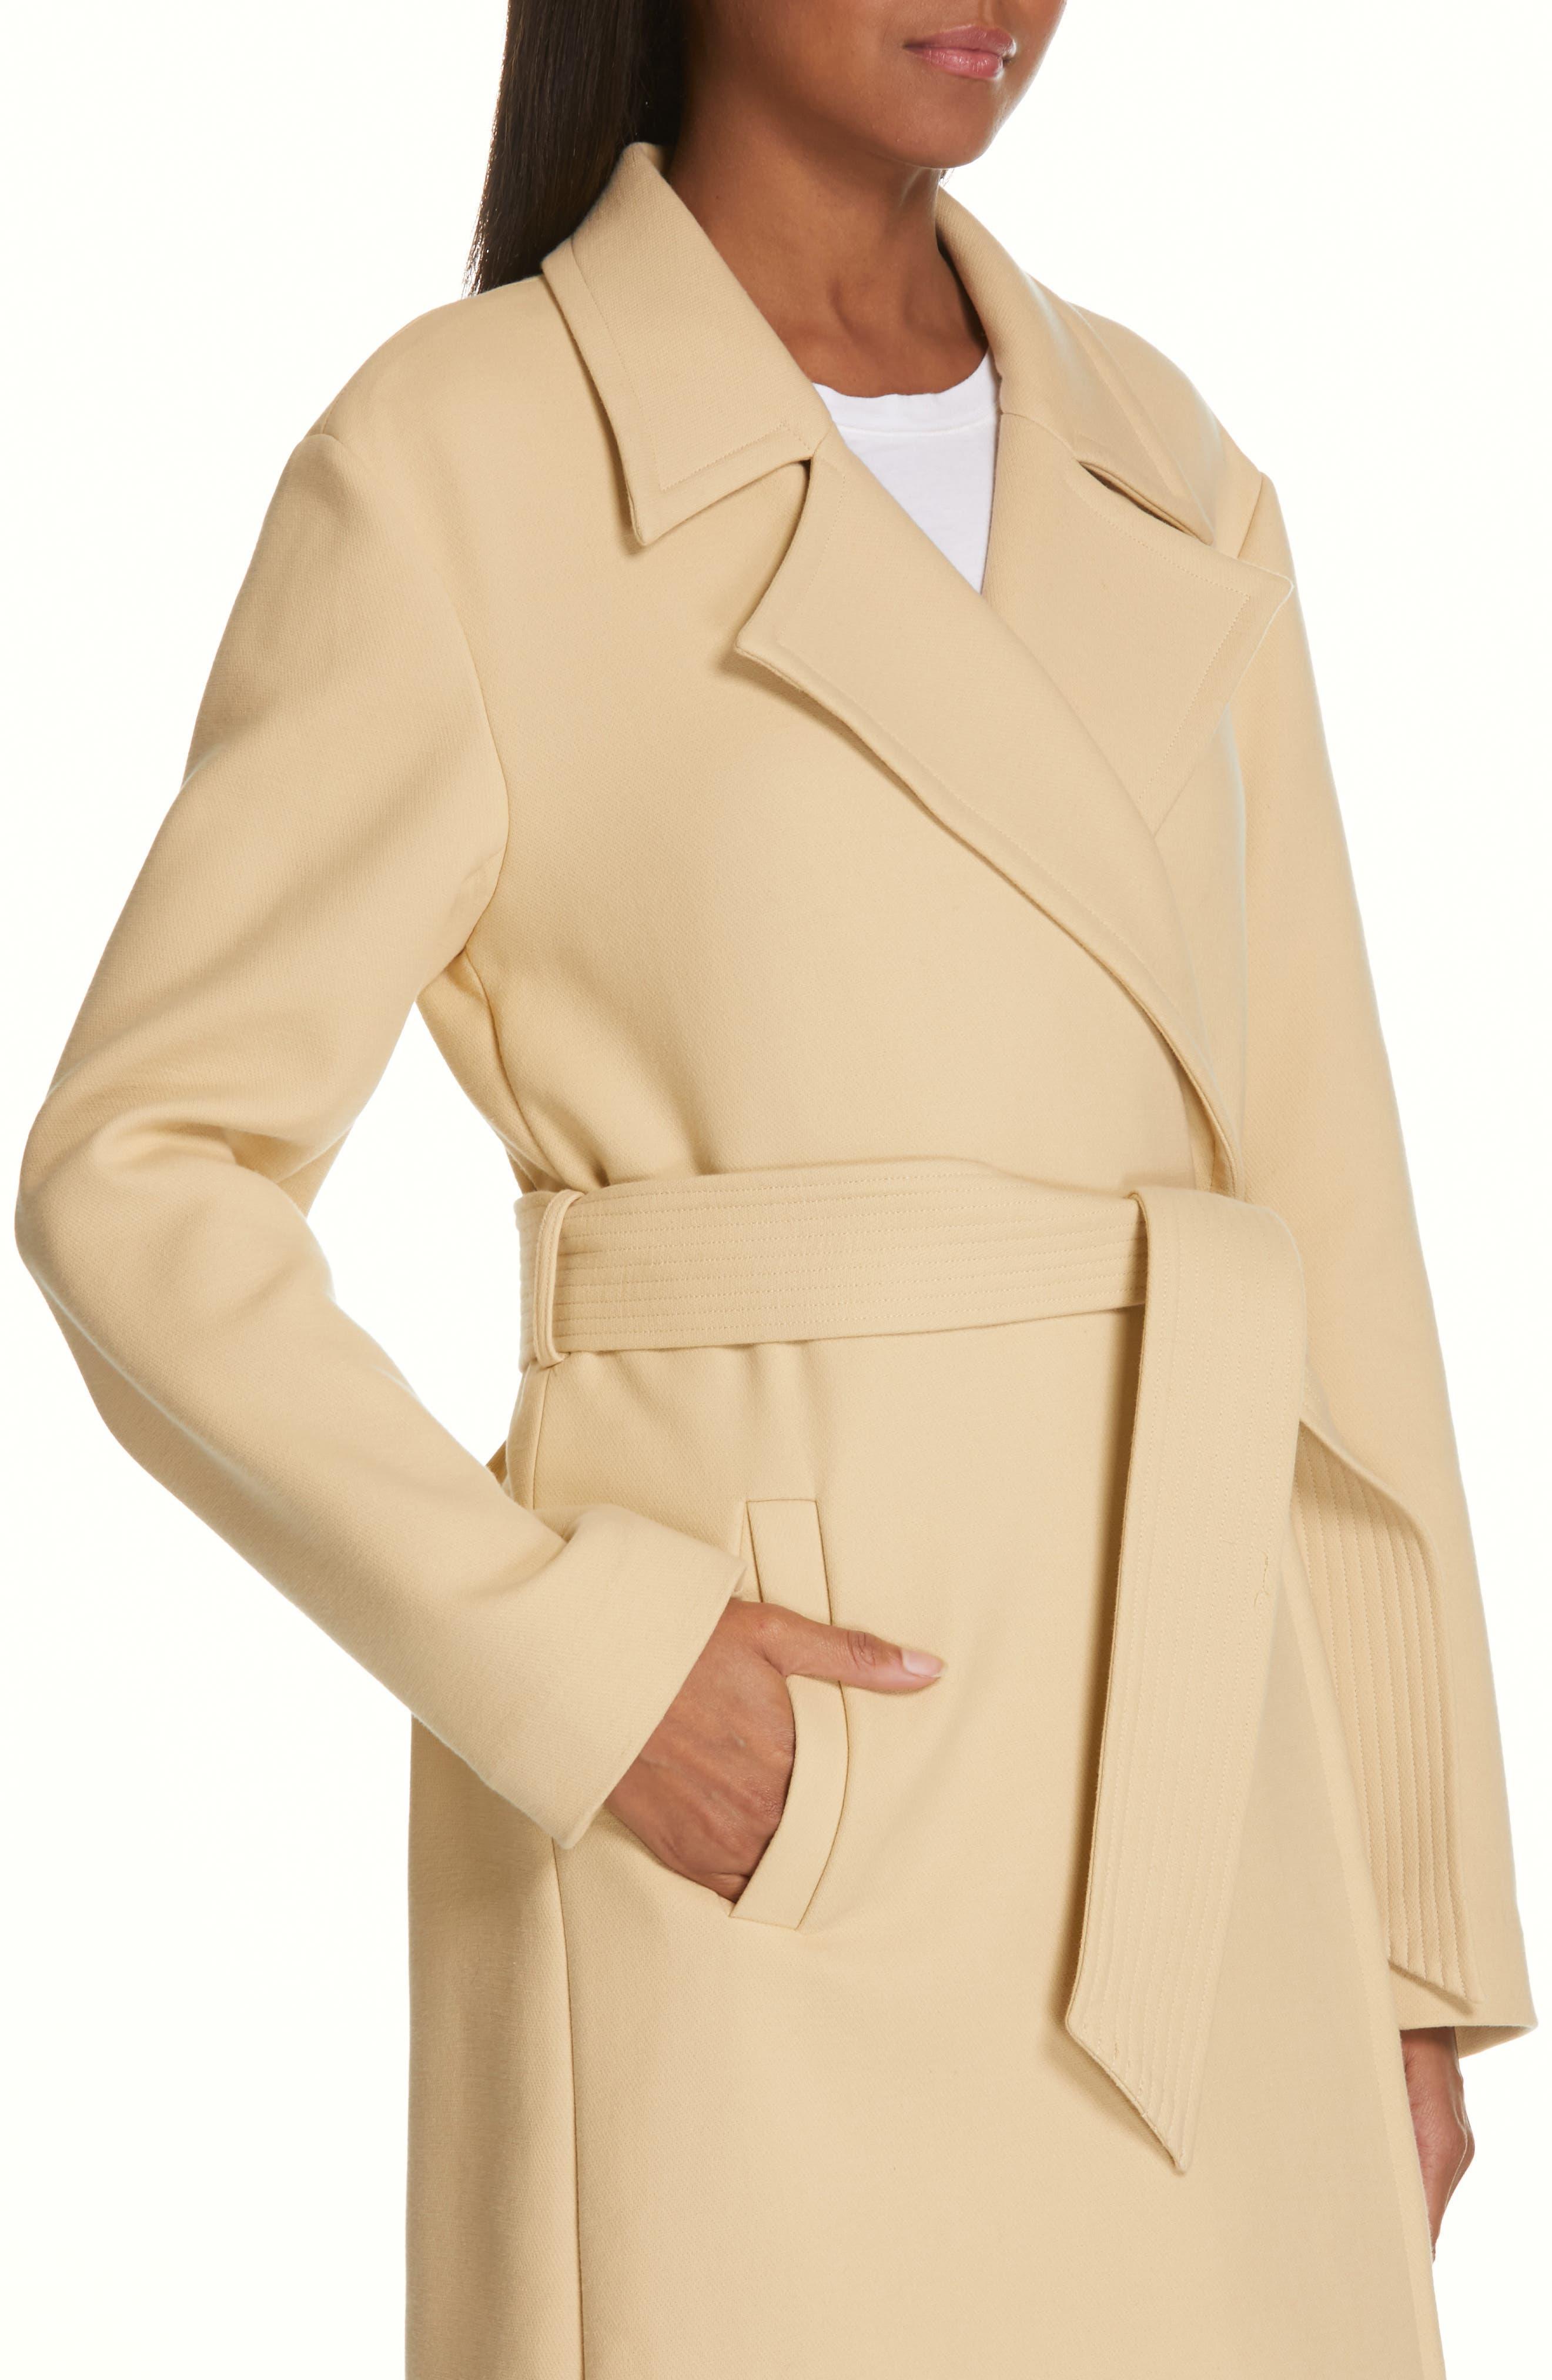 Alyssandra Trench Coat,                             Alternate thumbnail 4, color,                             BISCUIT